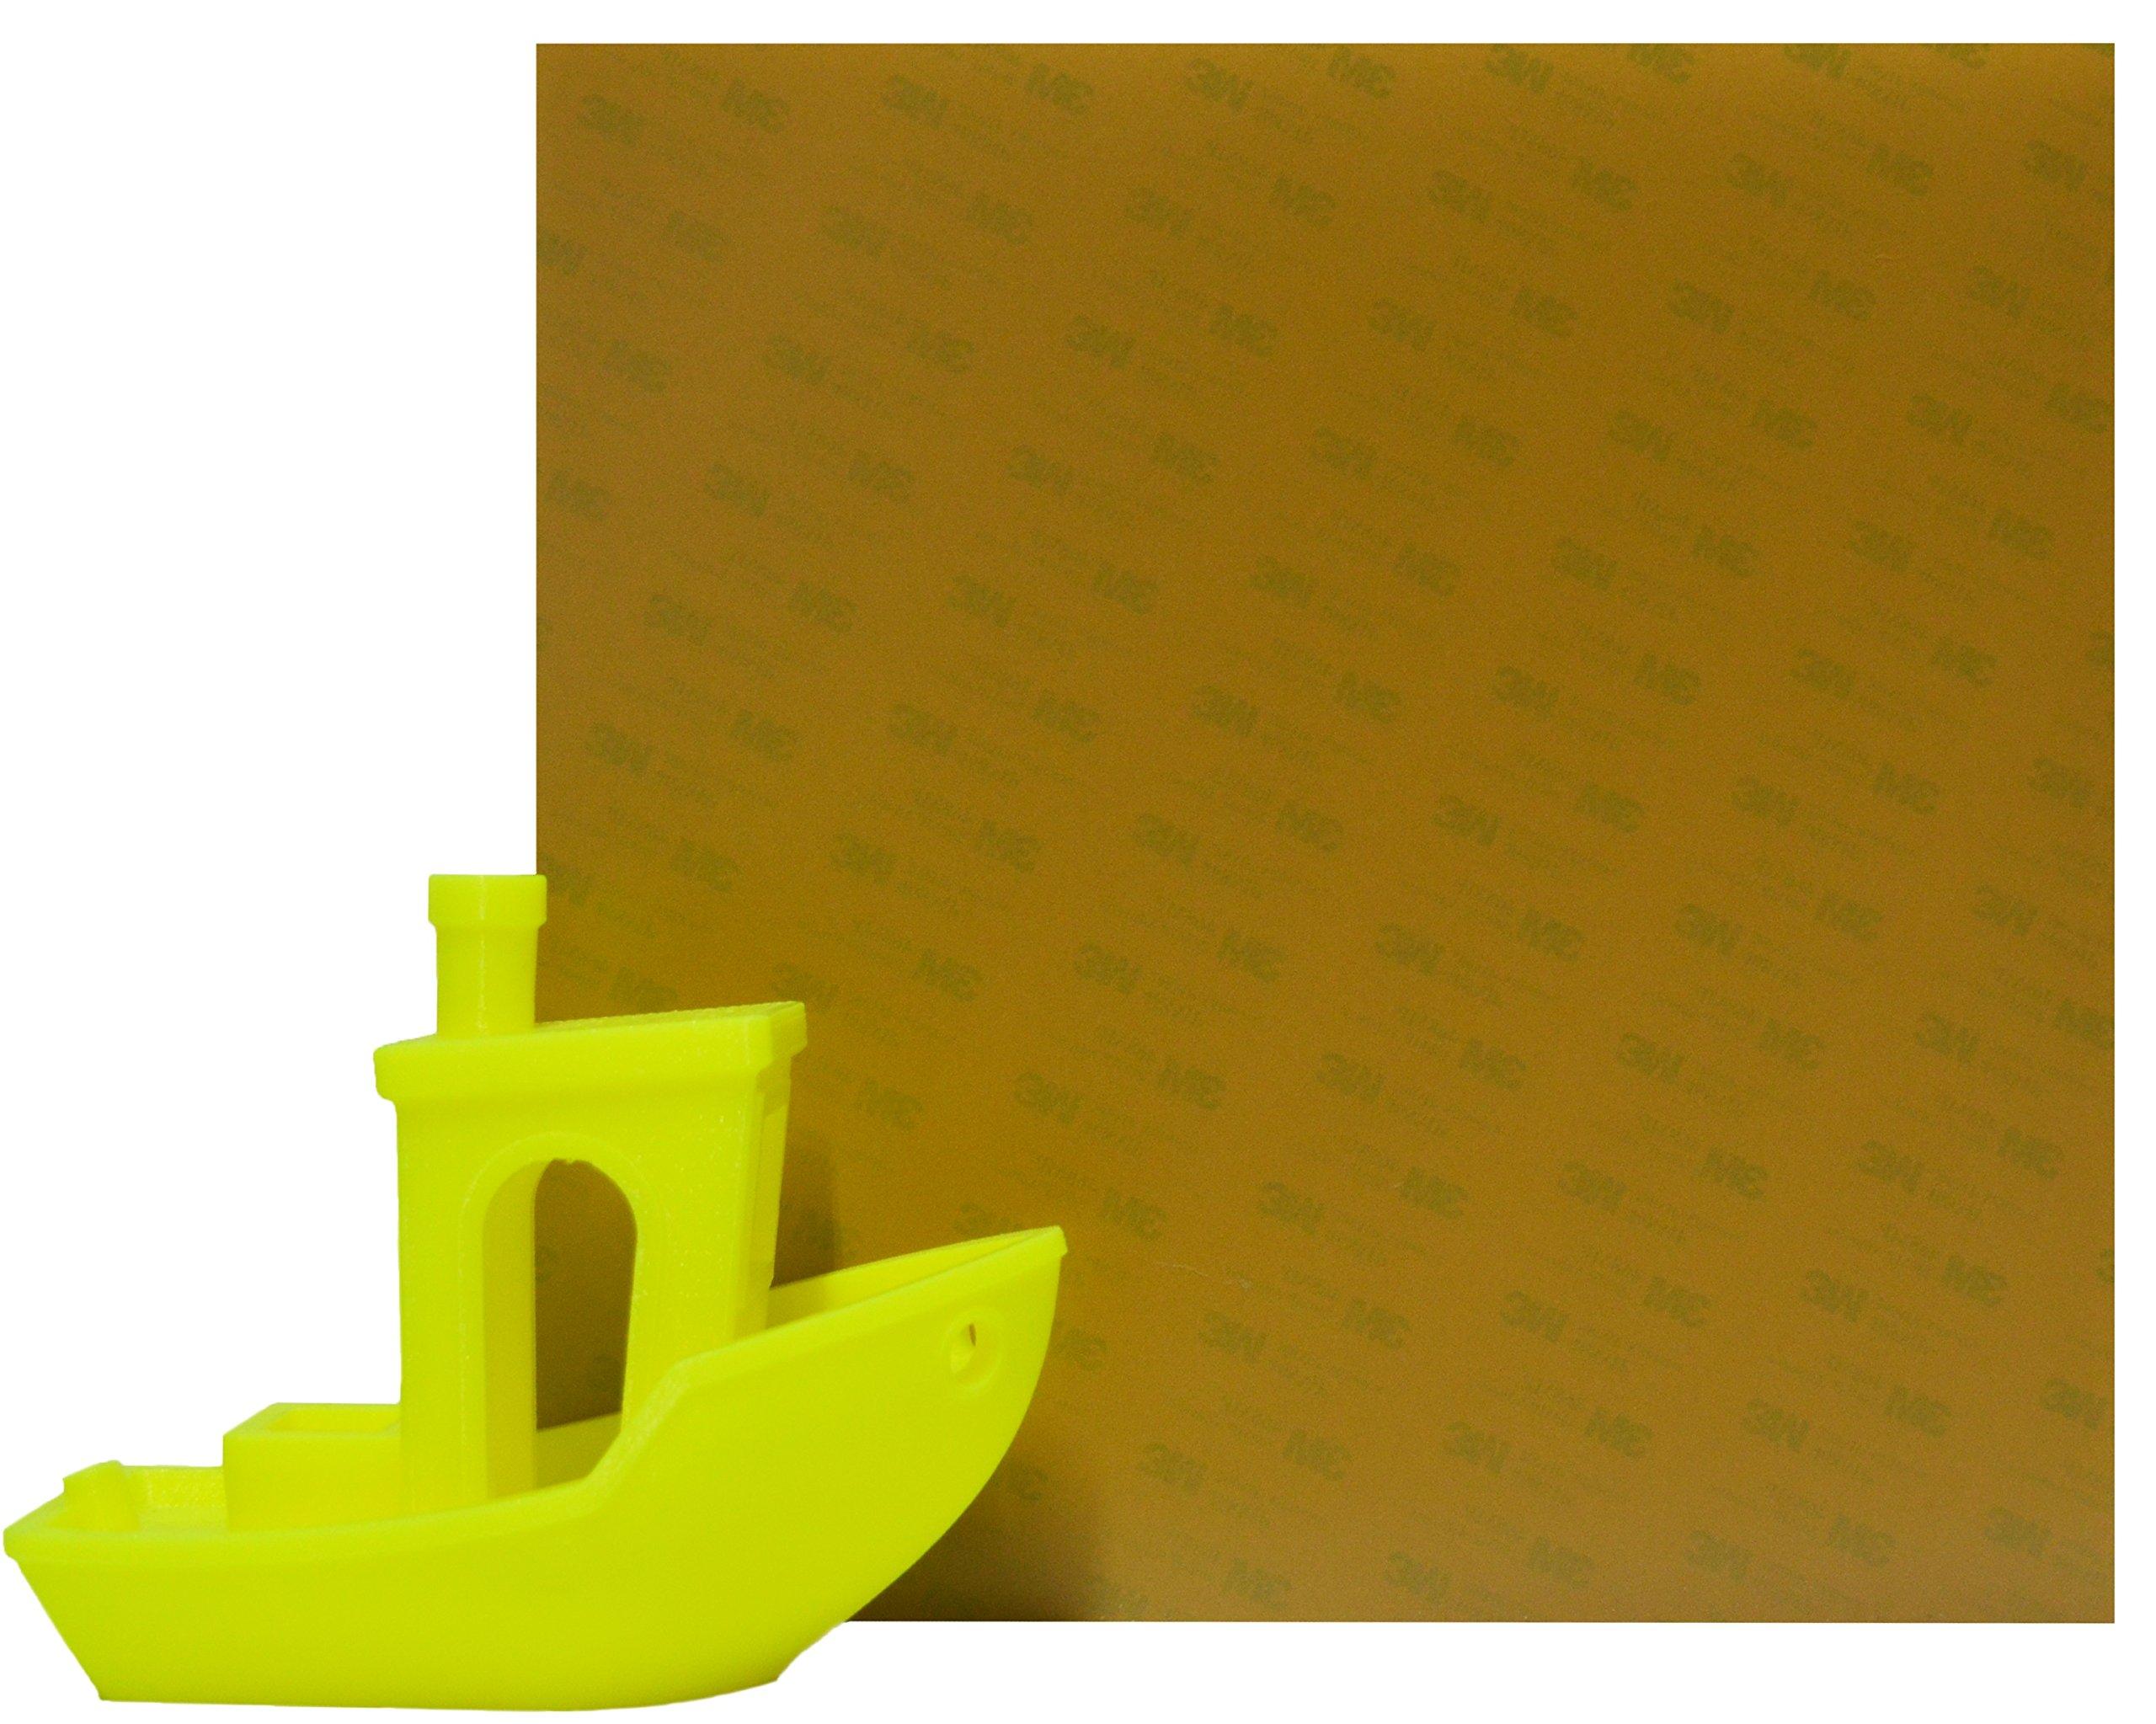 Prozix Amber PEI Sheet 3D Printer Build Surface 220mm x 220mm Ultem 1000 Build Surface for Anet A8, Anet A6, Reprap Prusa 13